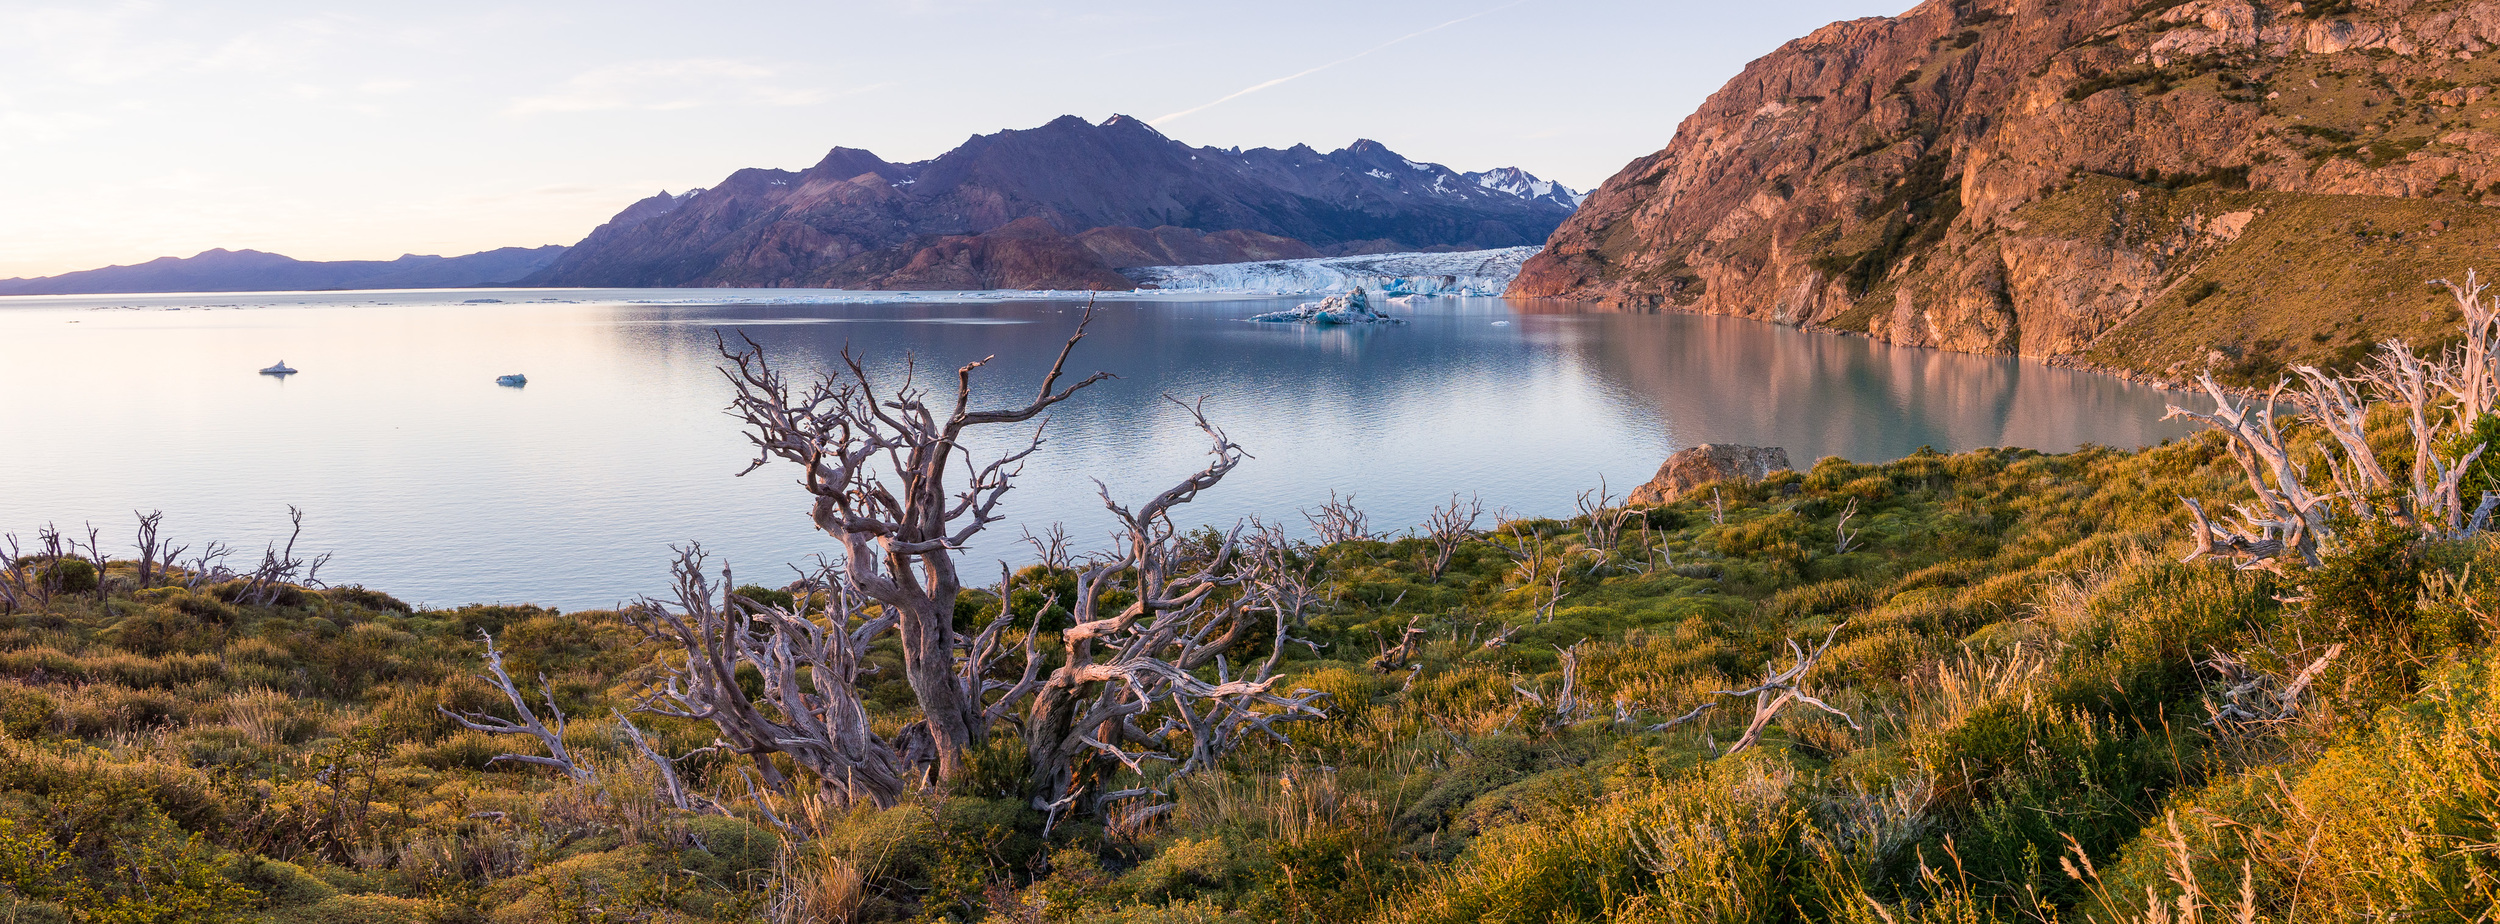 Patagonia - 130120 - 1205474-Pano.jpg